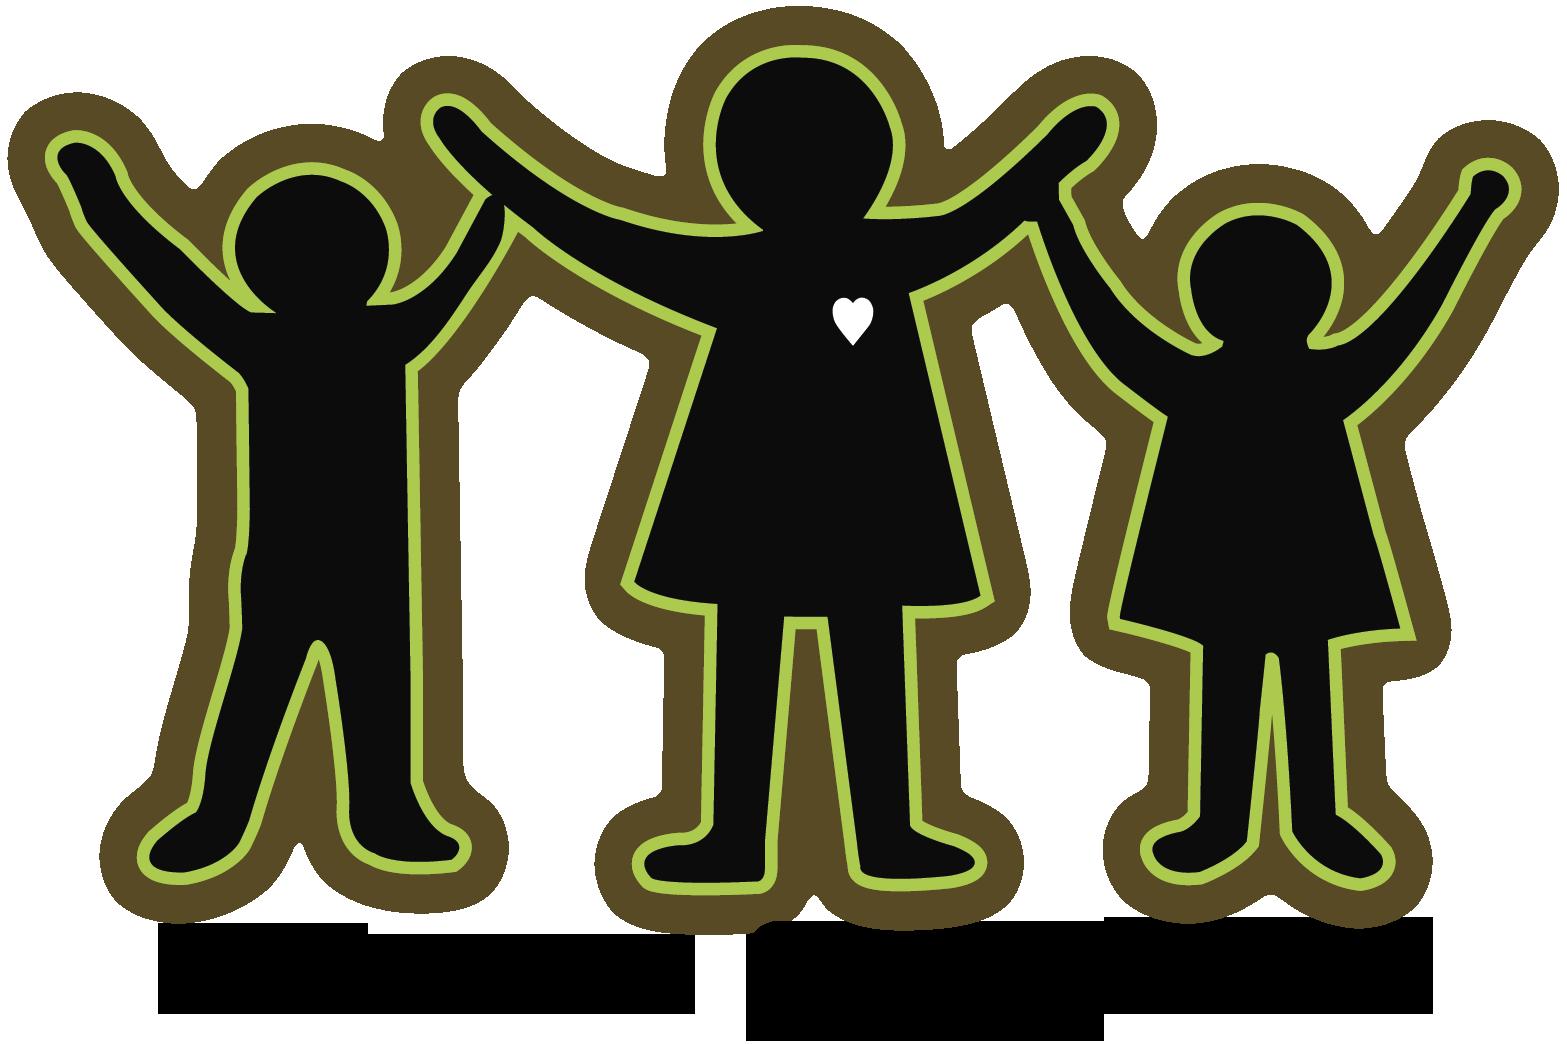 Connecting for kids meet. Organization clipart social awareness